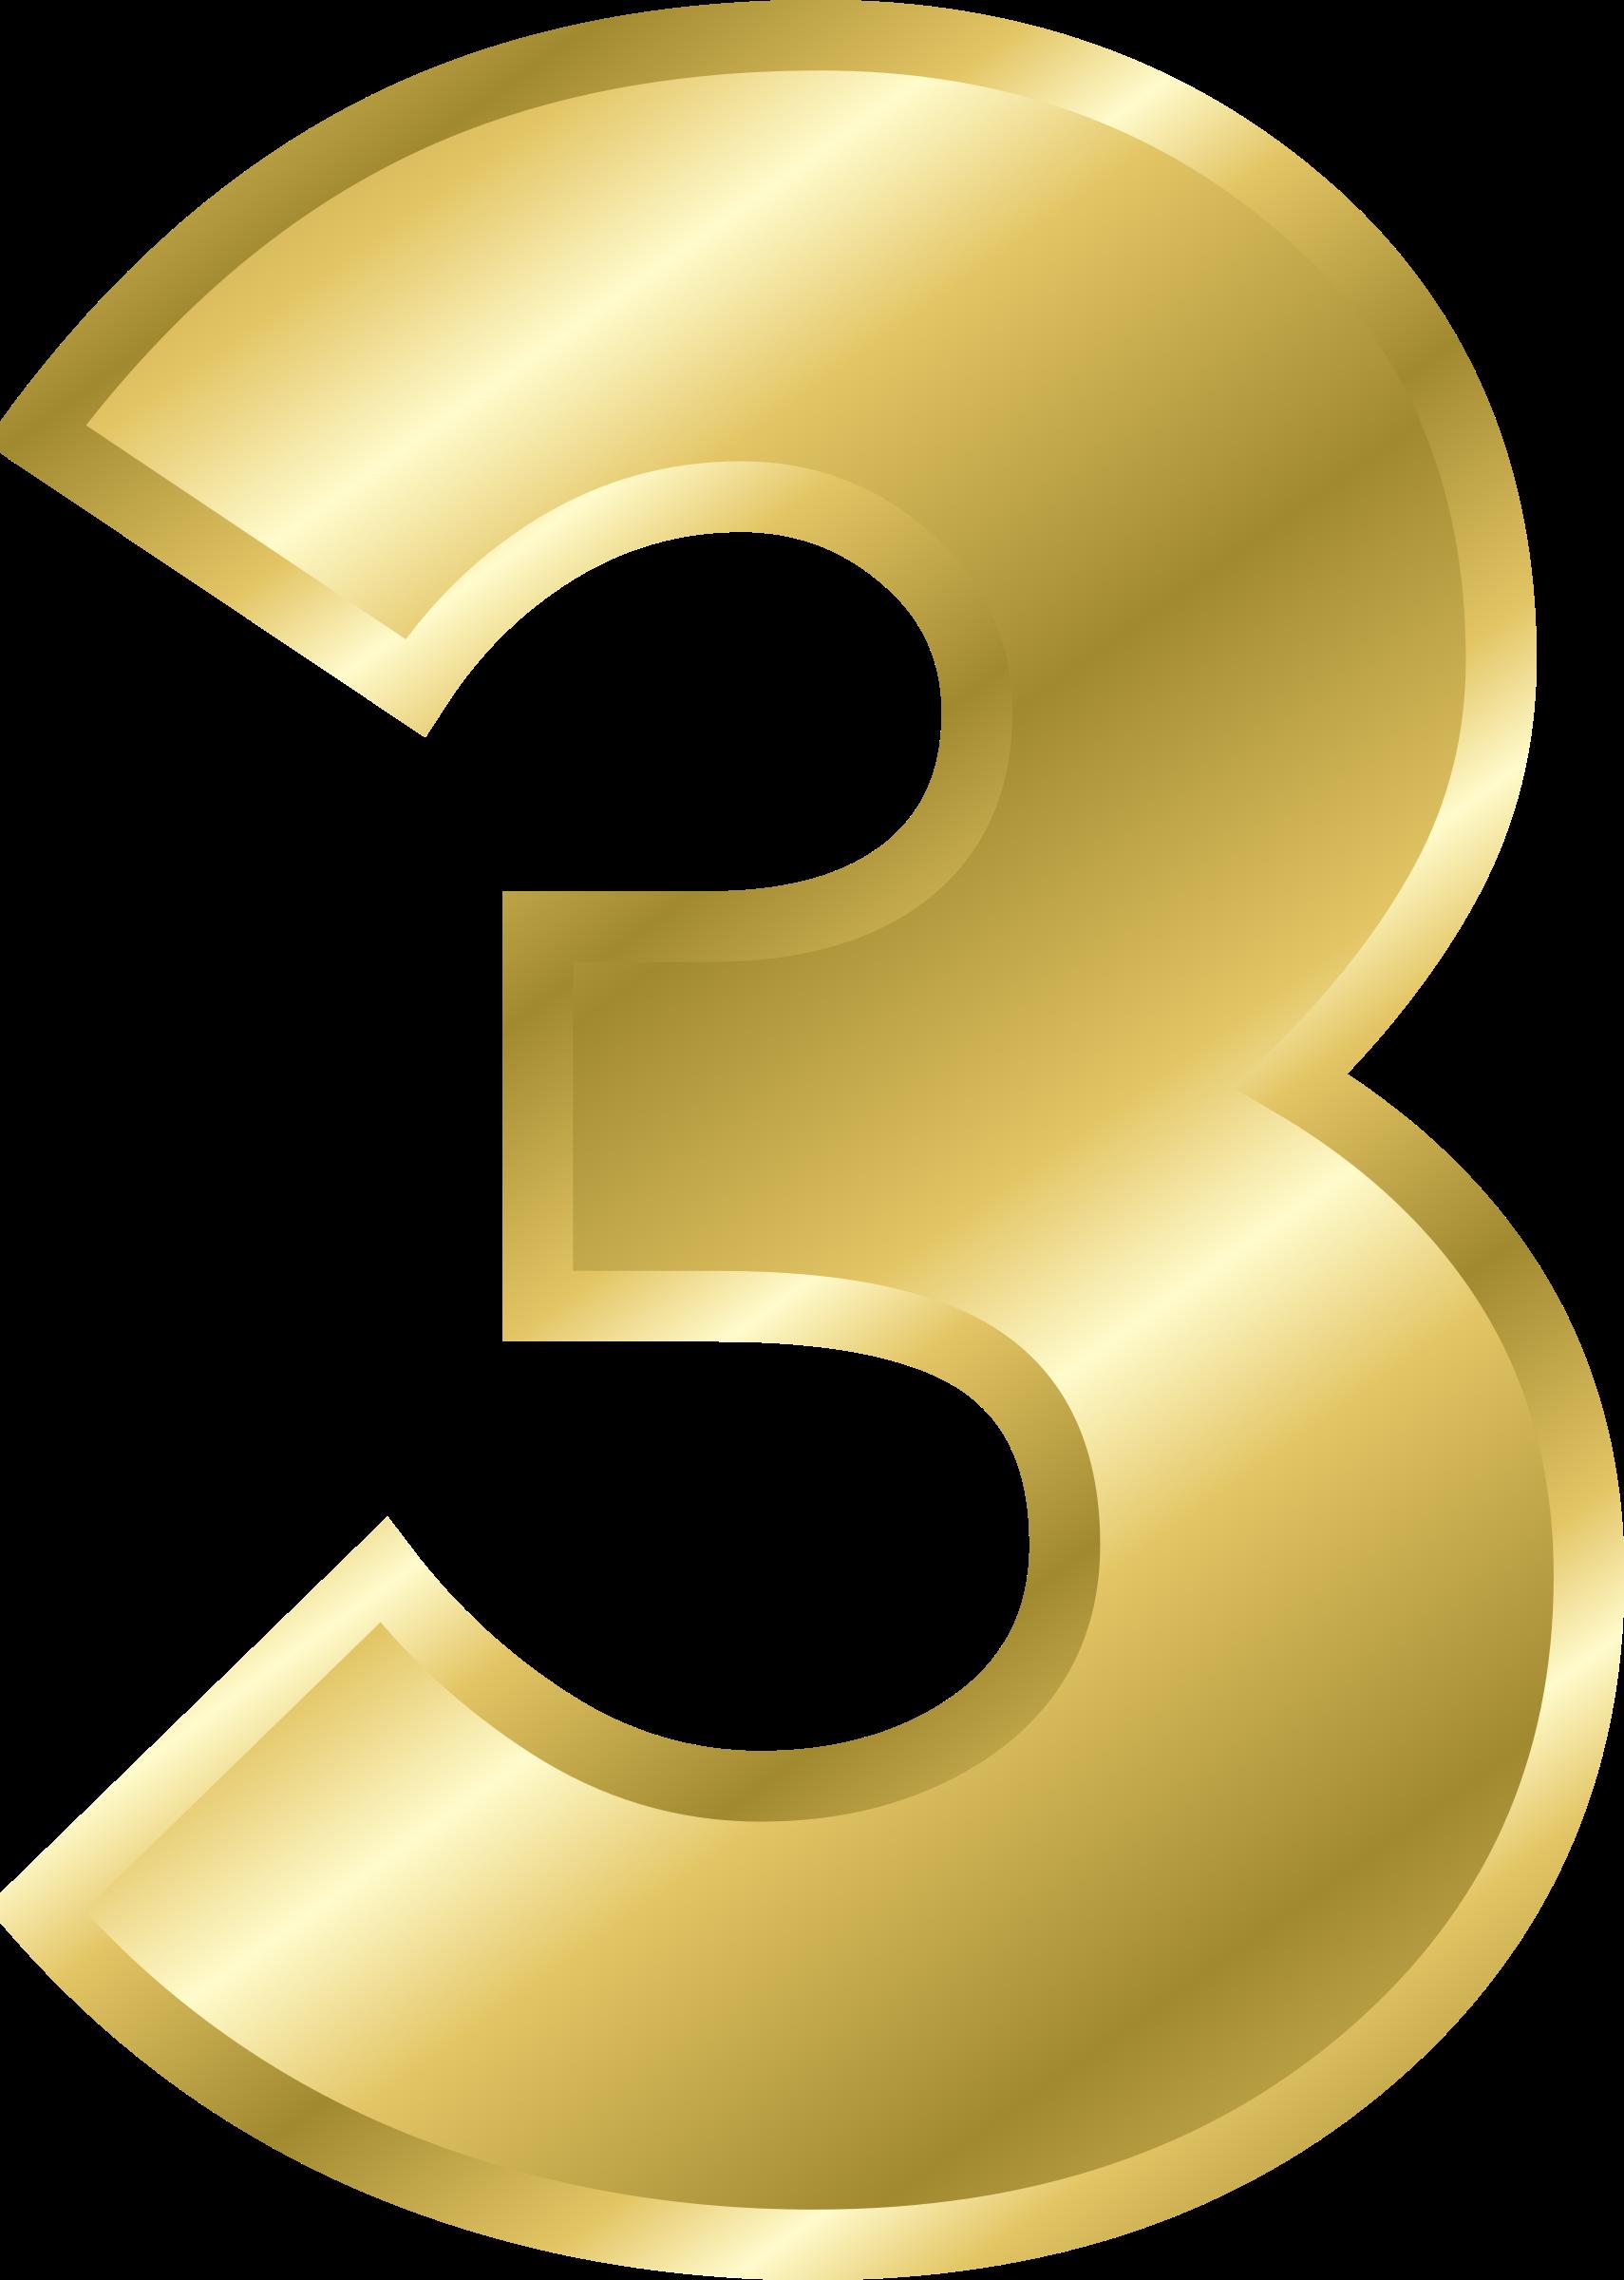 Number 3 clipart gold, Number 3 gold Transparent FREE for.